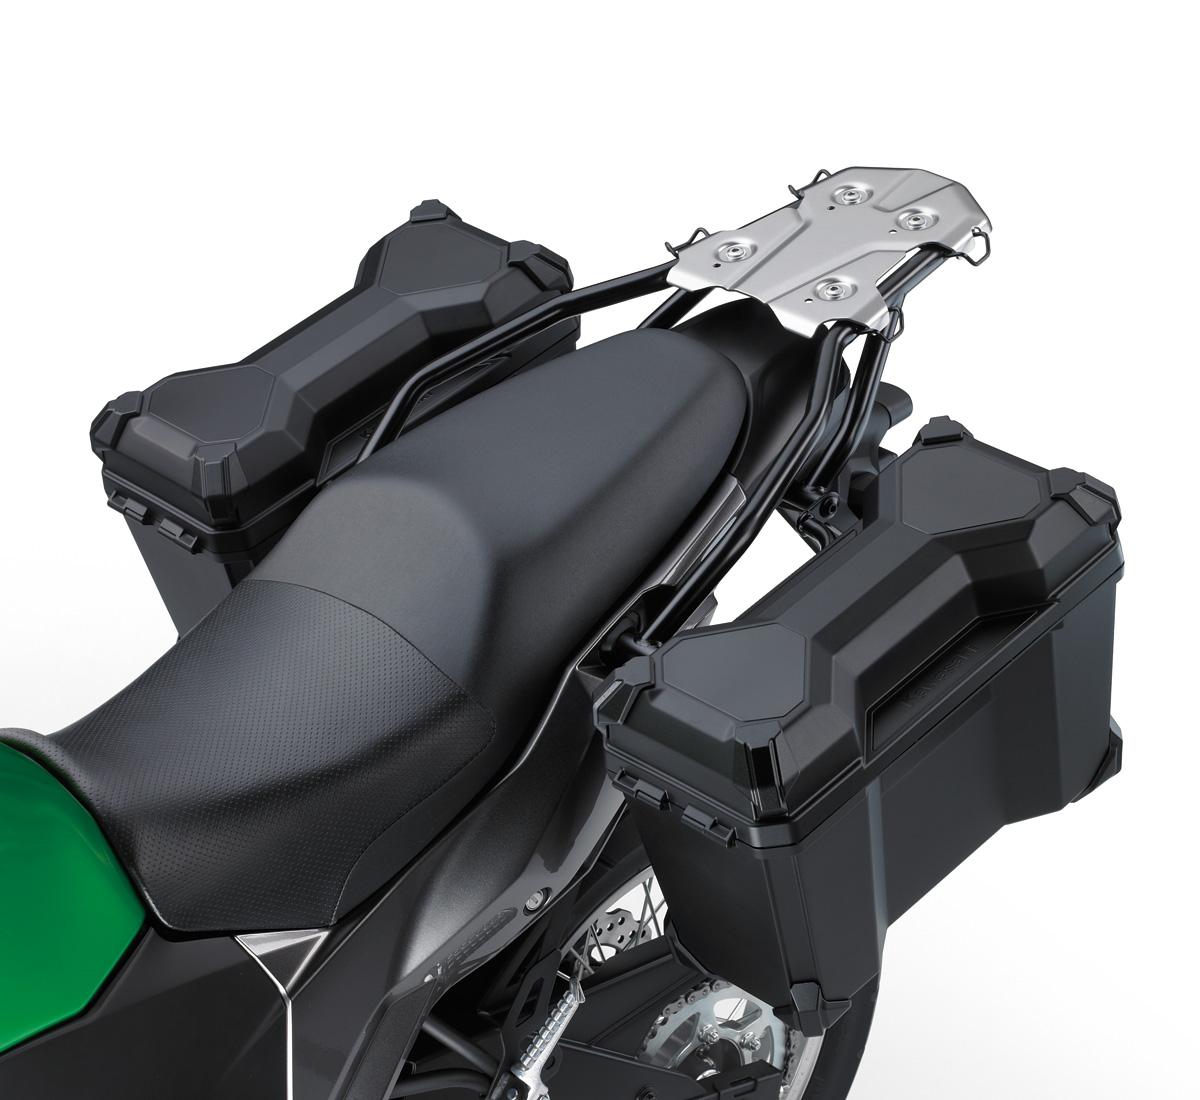 hight resolution of 17 liter hard saddlebag set